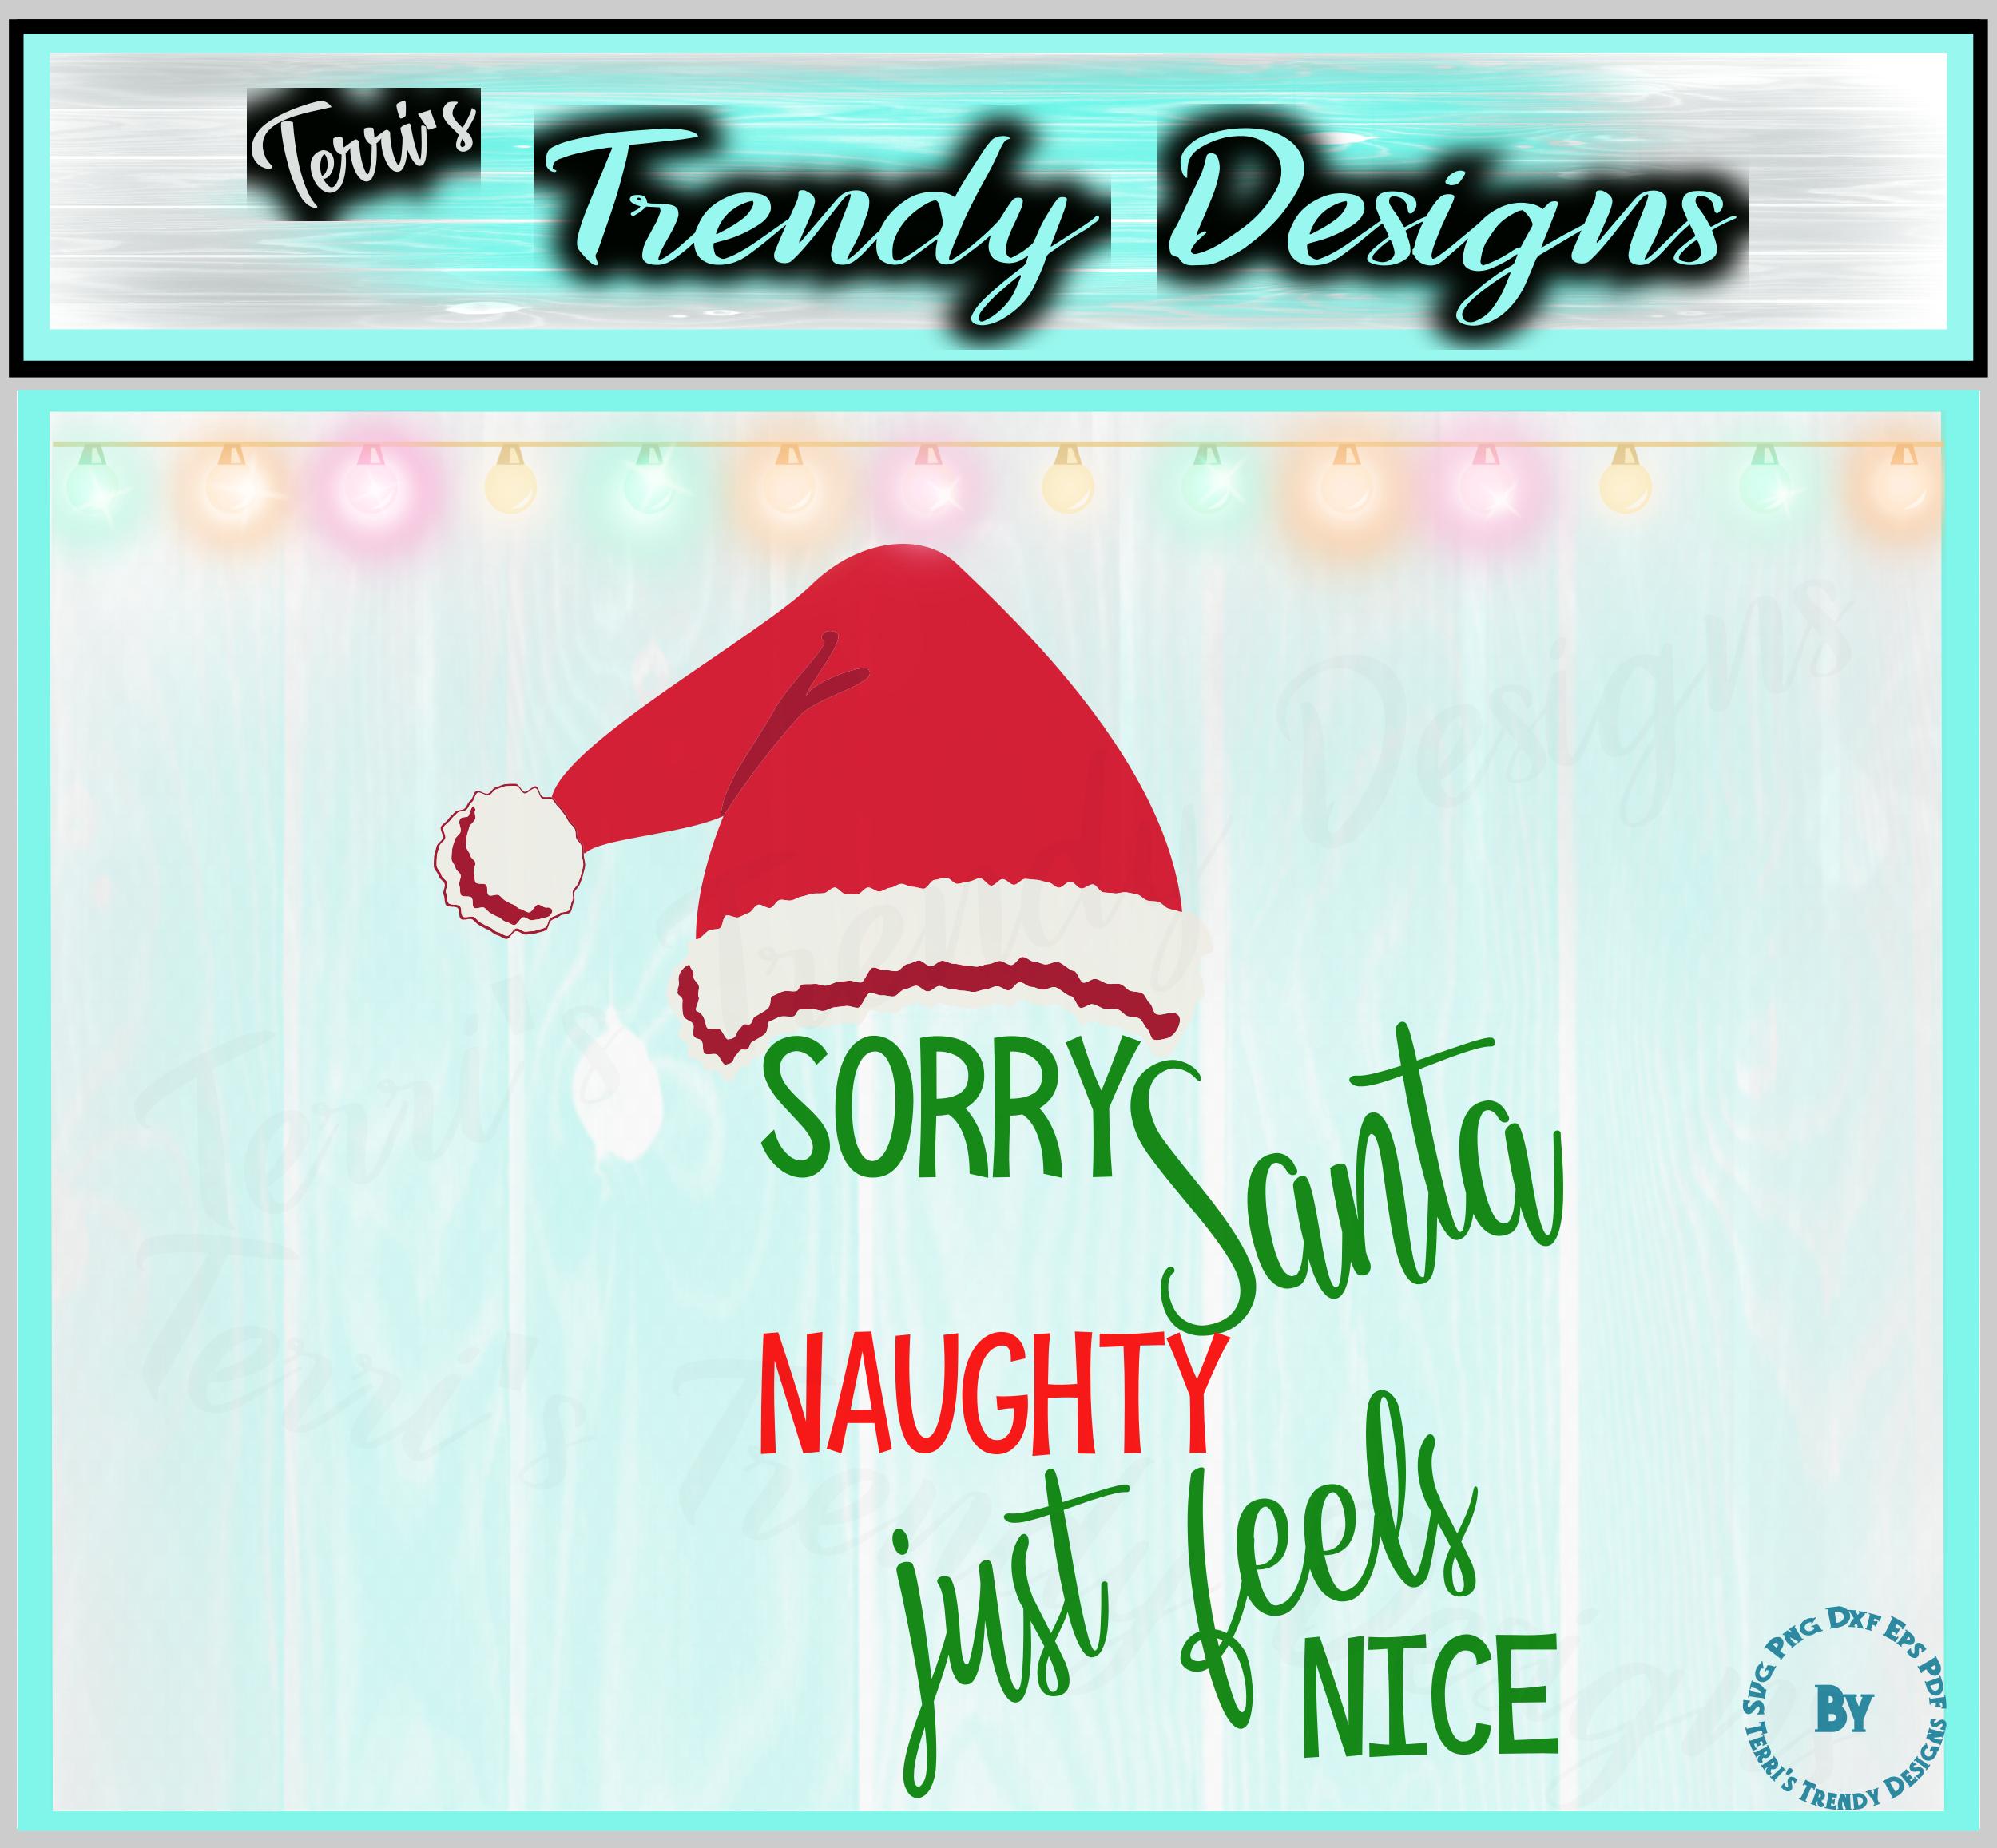 Sorry Santa naughty just feels nice funny Christmas design example image 2